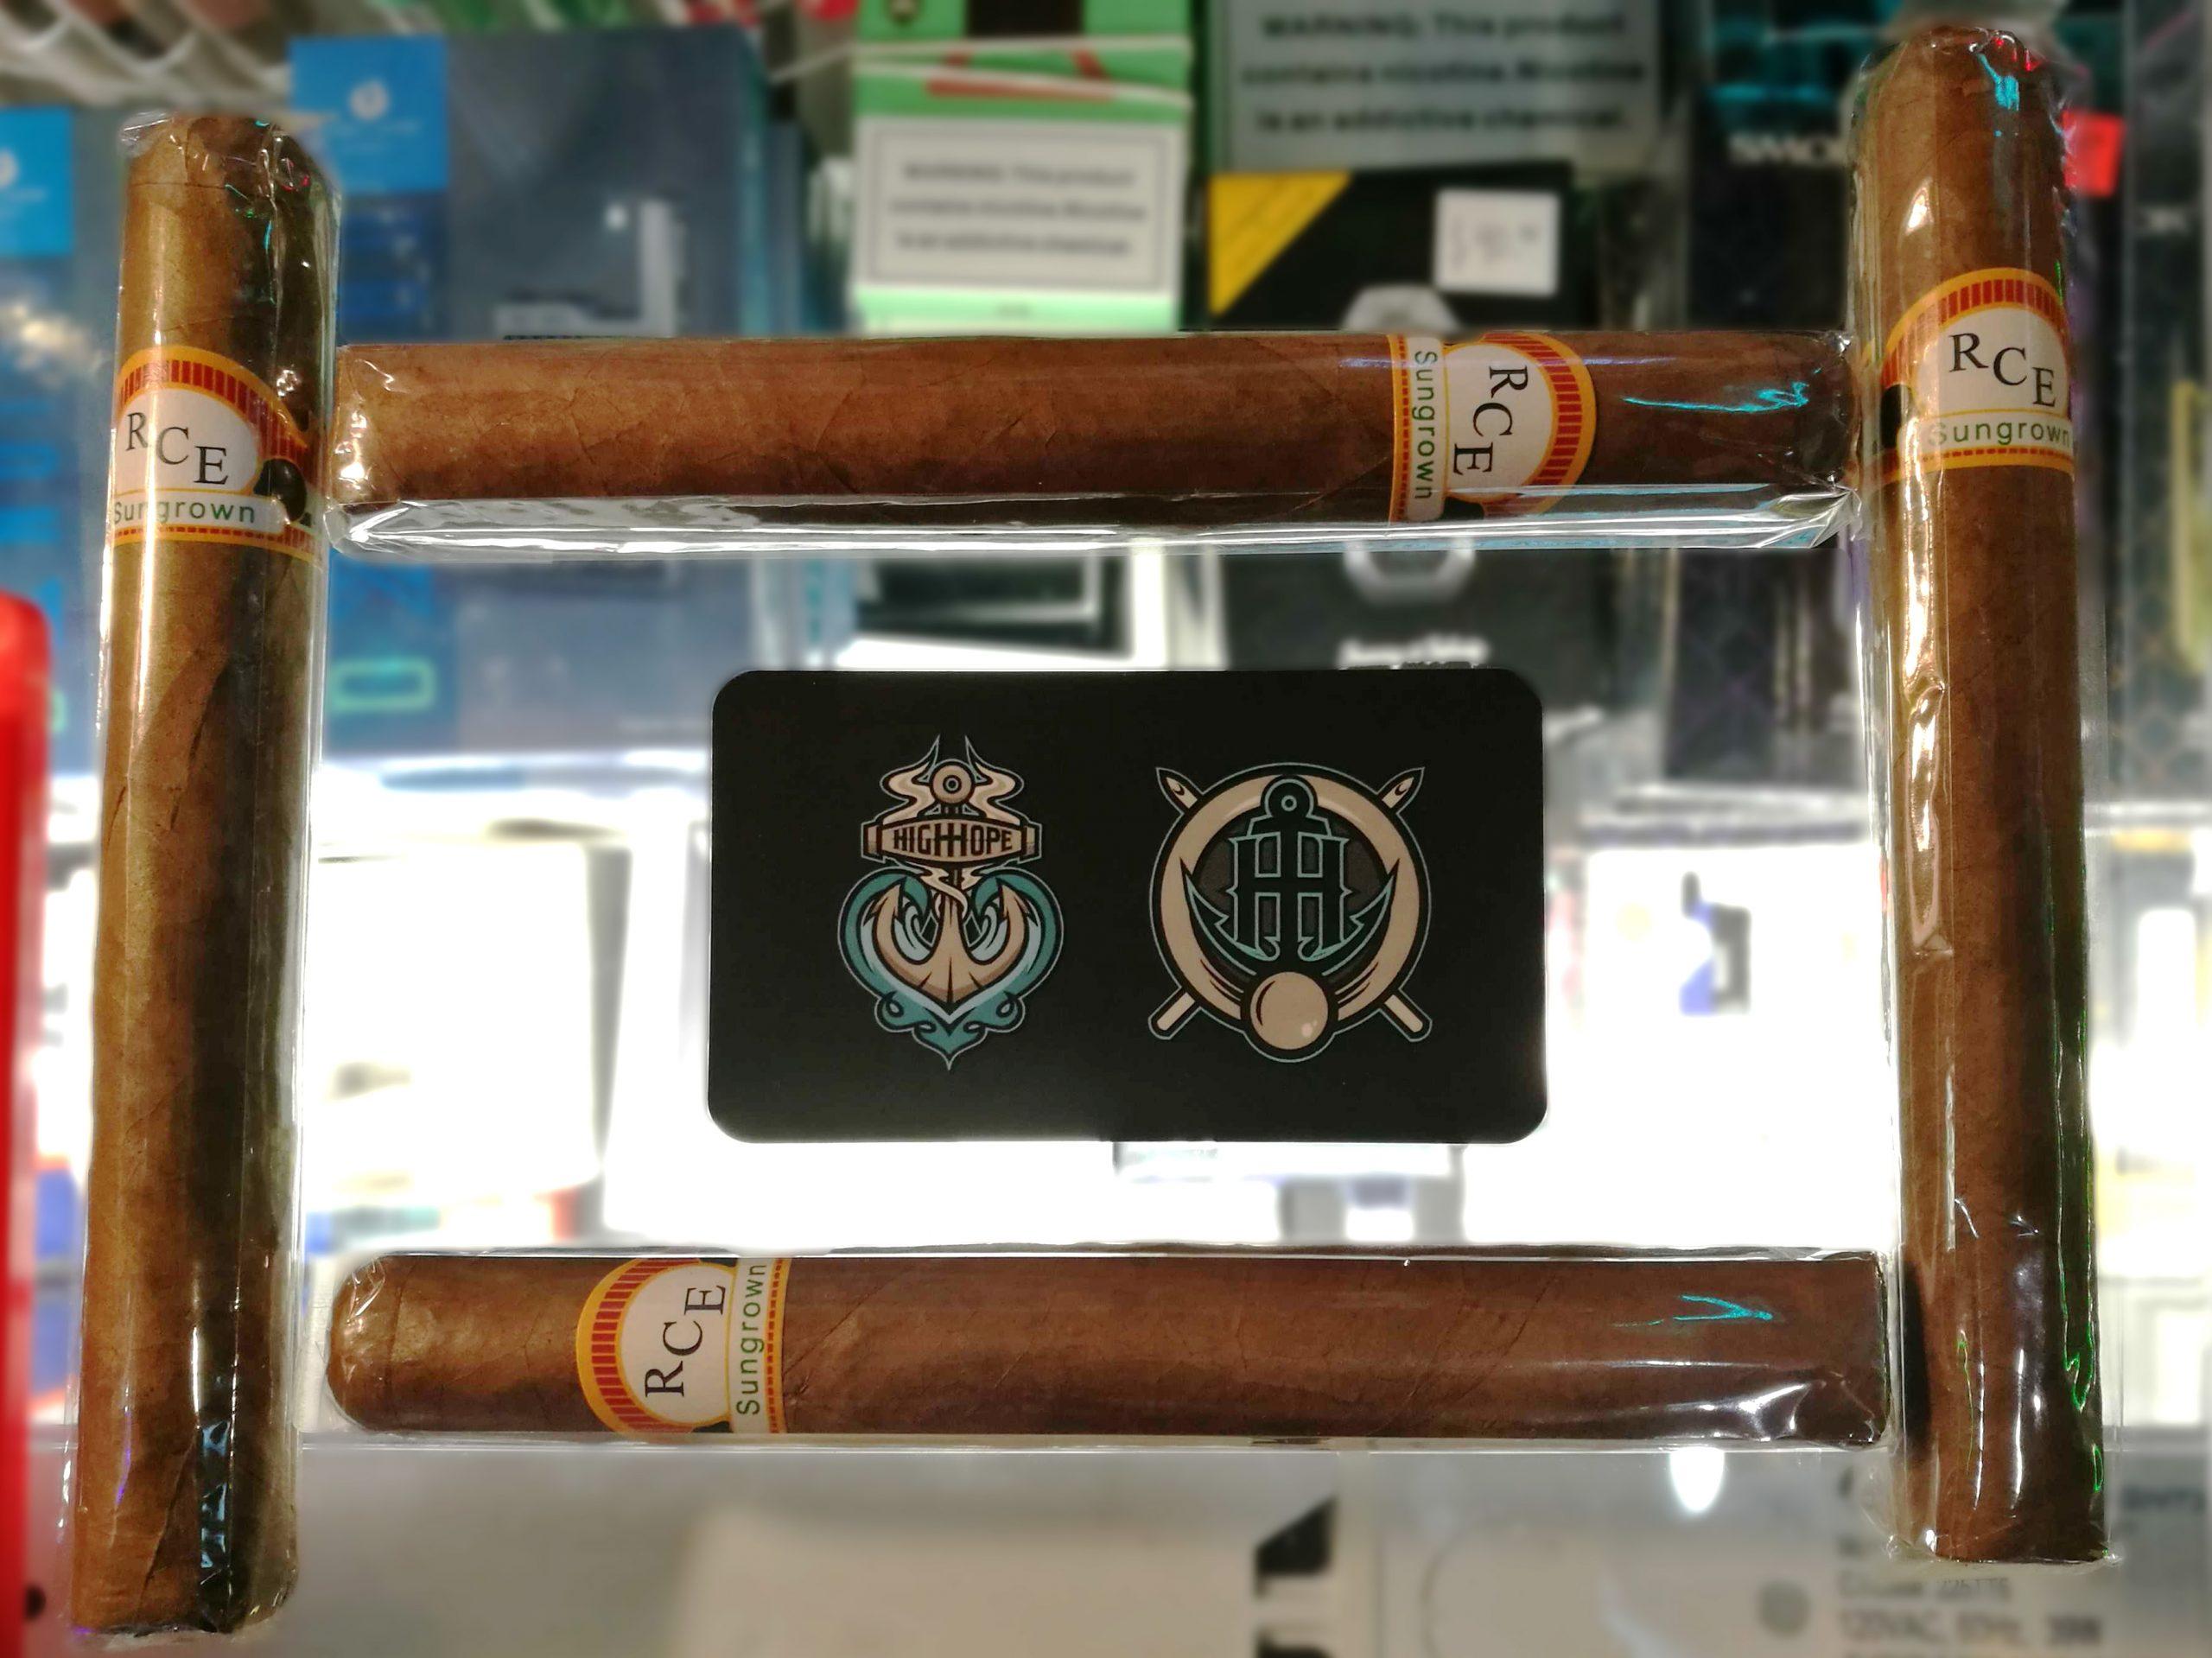 RCE cigars